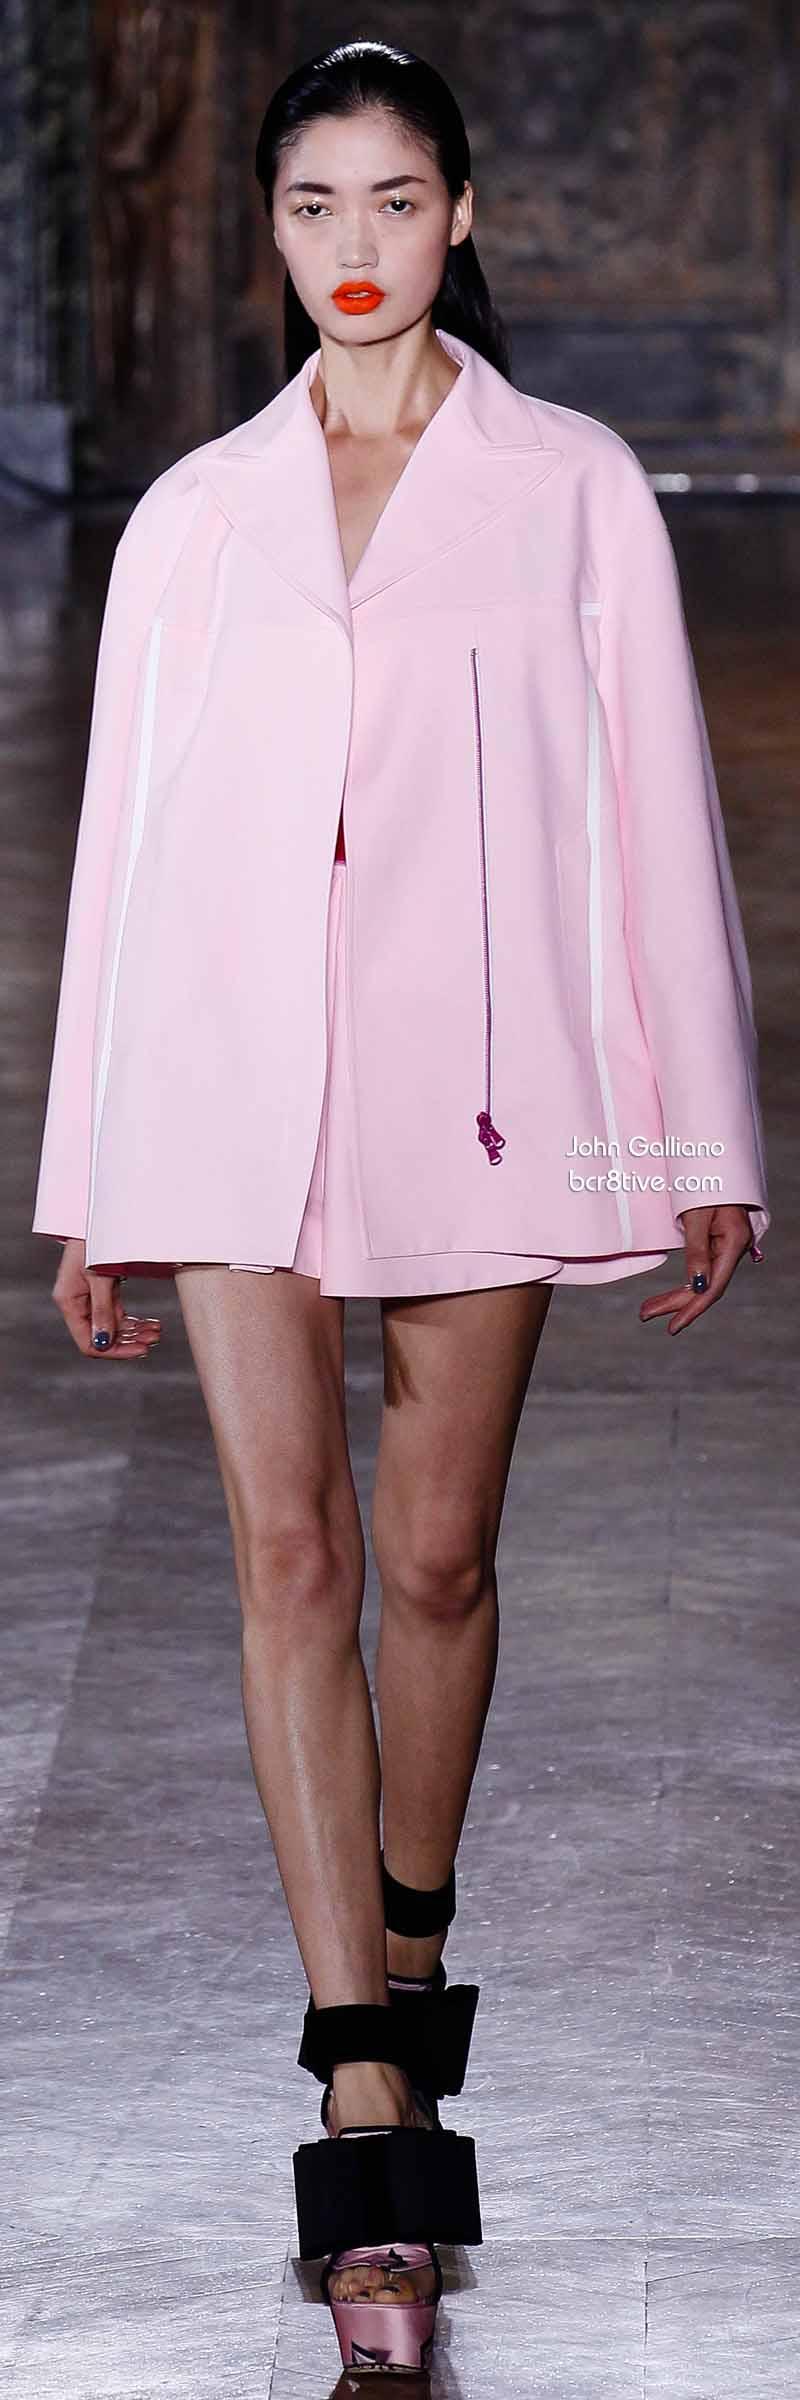 John Galliano - Baby Pink Car Length Coat Dress